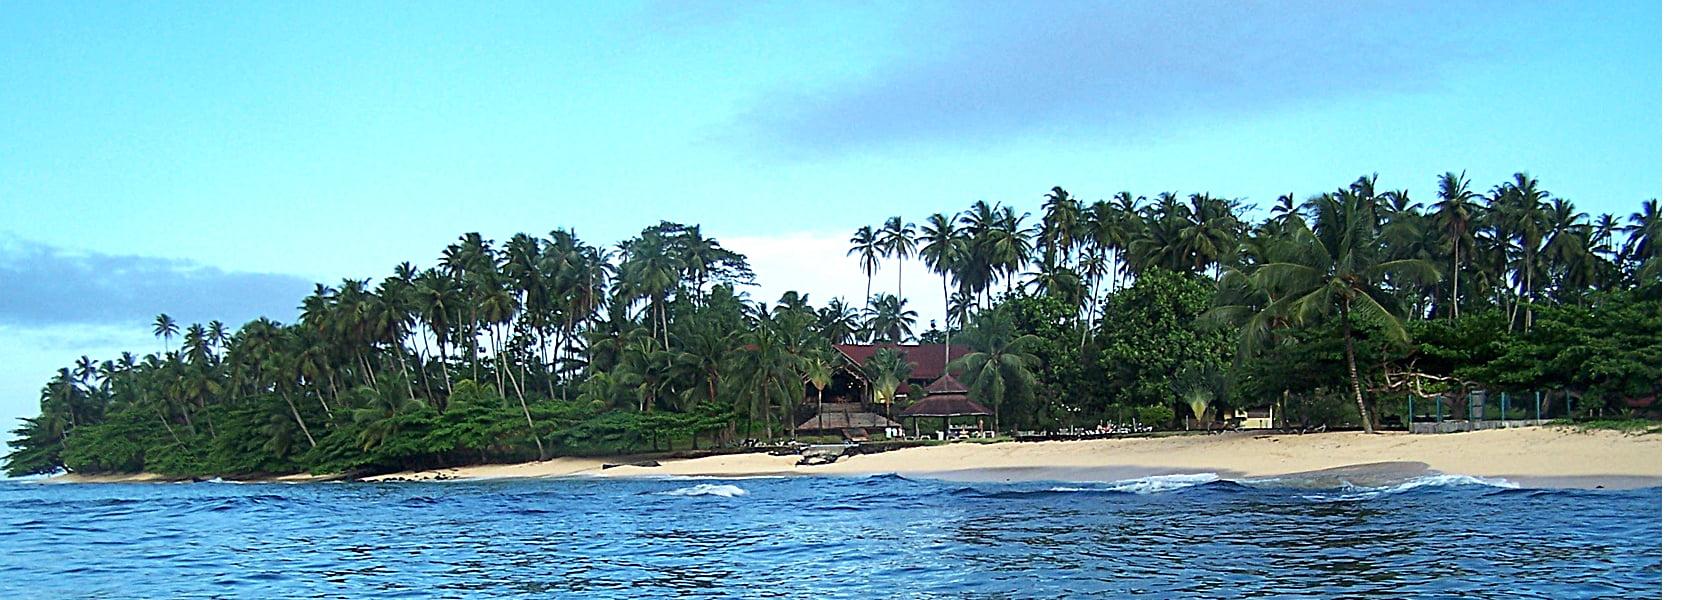 Sao Tomé & Principe | Budgetvriendelijke kennismakingsreis Sao Tomé